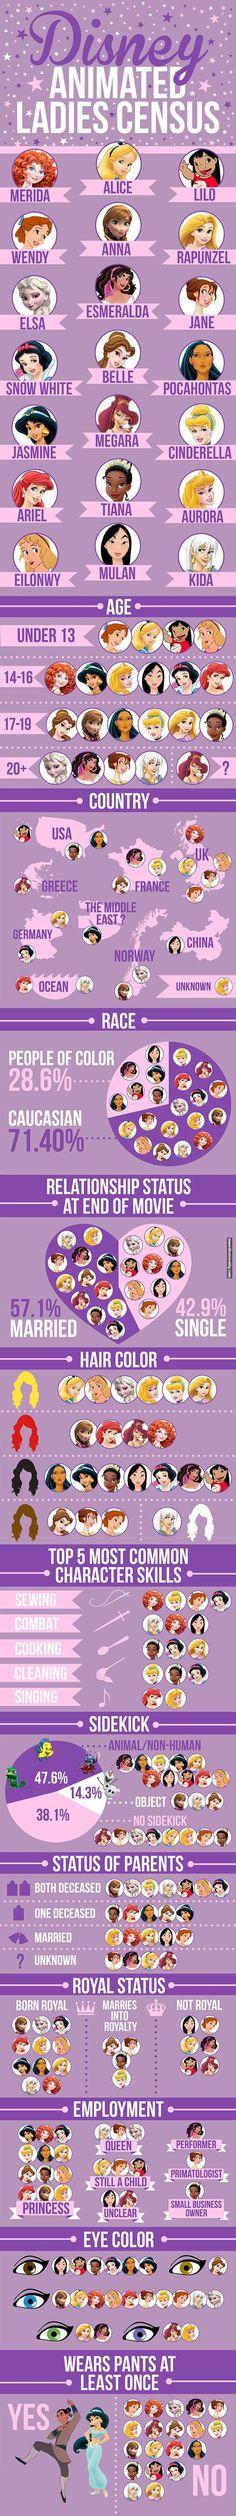 Disney princess statistics